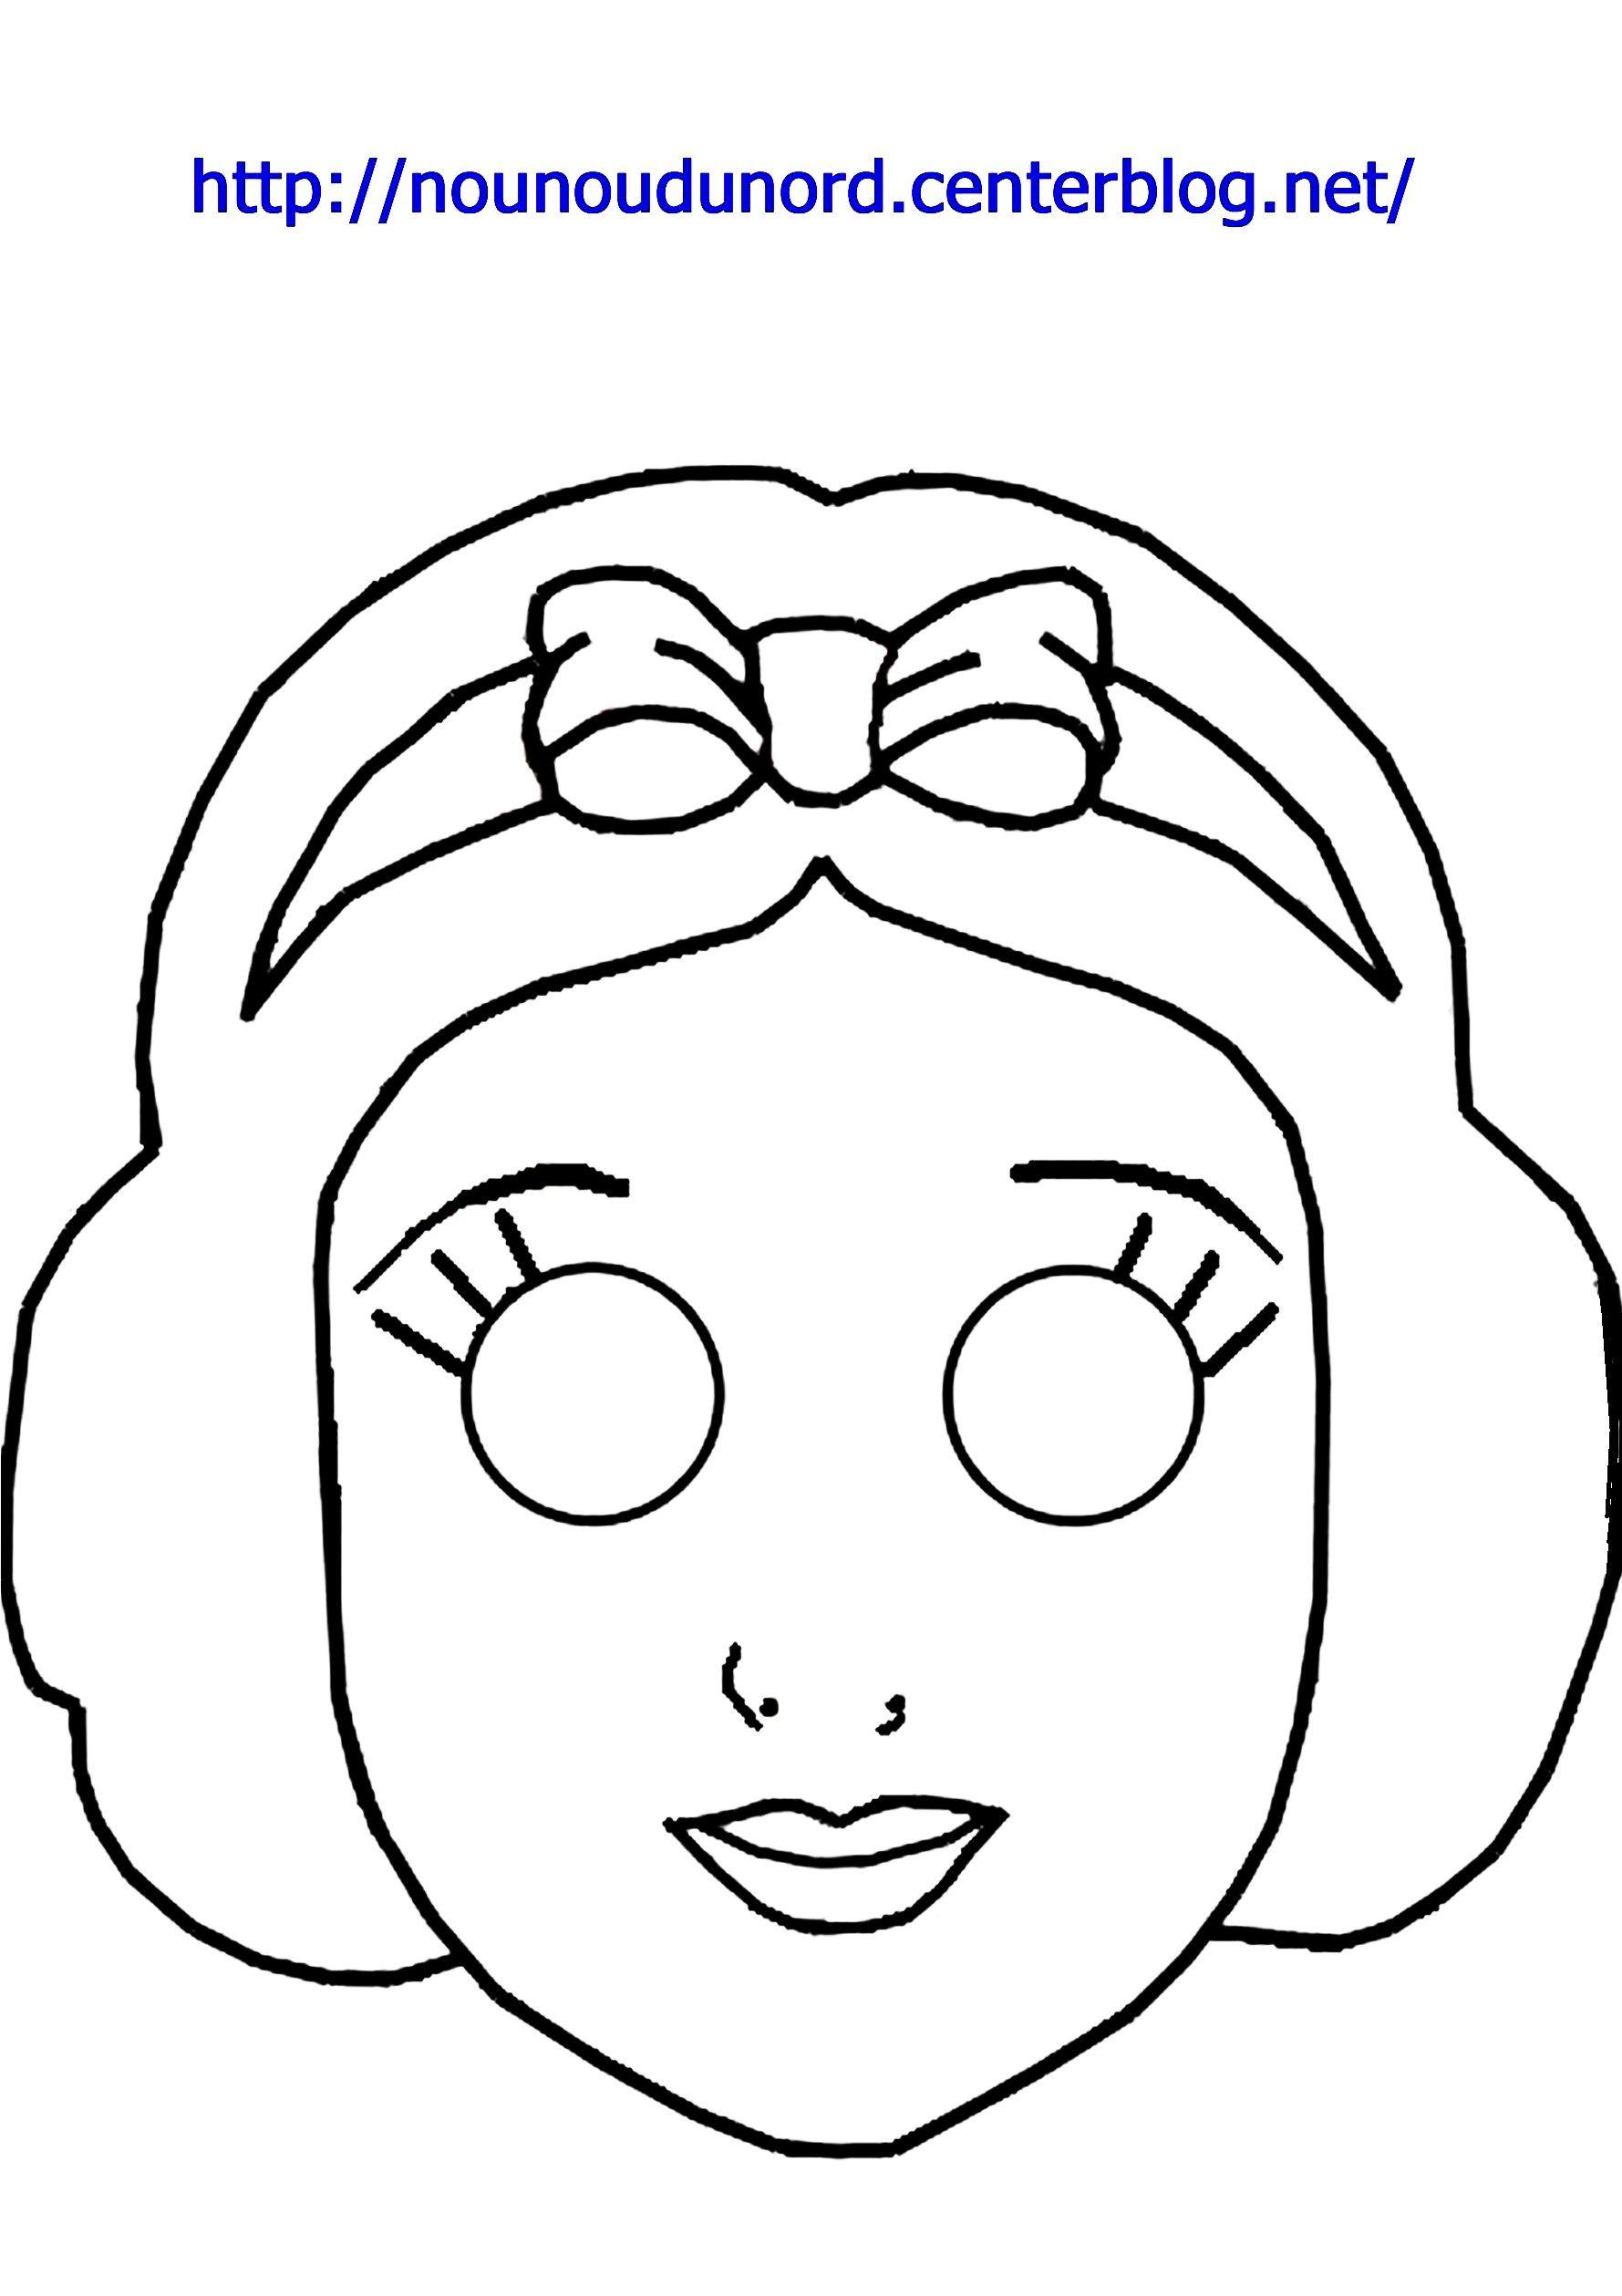 Masque Blanche Neige À Imprimer concernant Blanche Neige À Colorier Et Imprimer